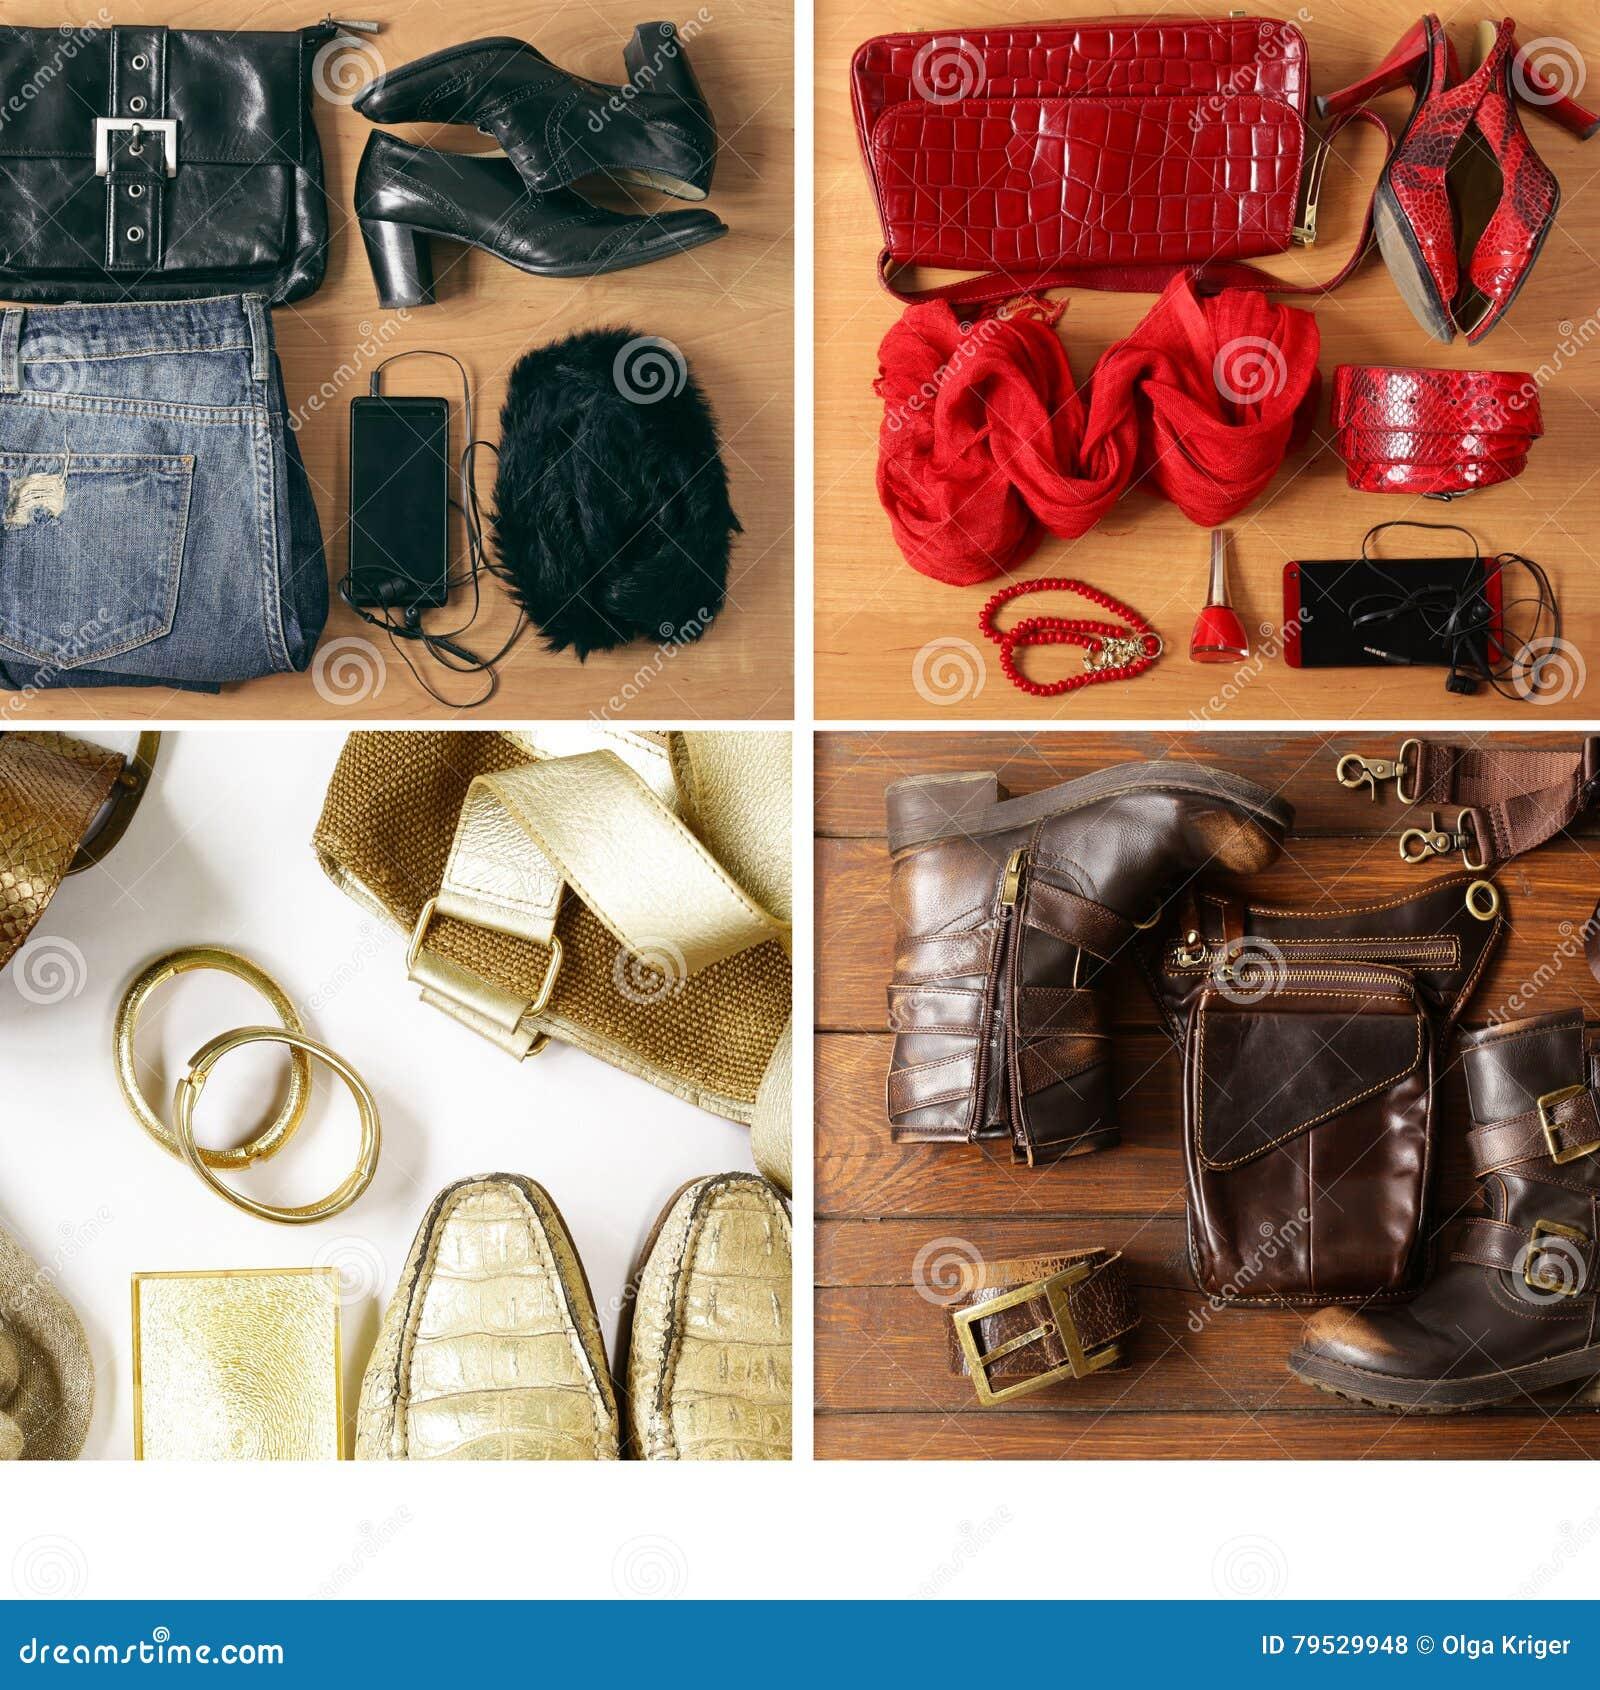 3922ef142d3 Κολάζ, καθορισμένα ενδύματα μόδας συνόλου περιστασιακά - τζιν, παπούτσια,  εξαρτήματα. Περισσότερες παρόμοιες στοκ εικόνες